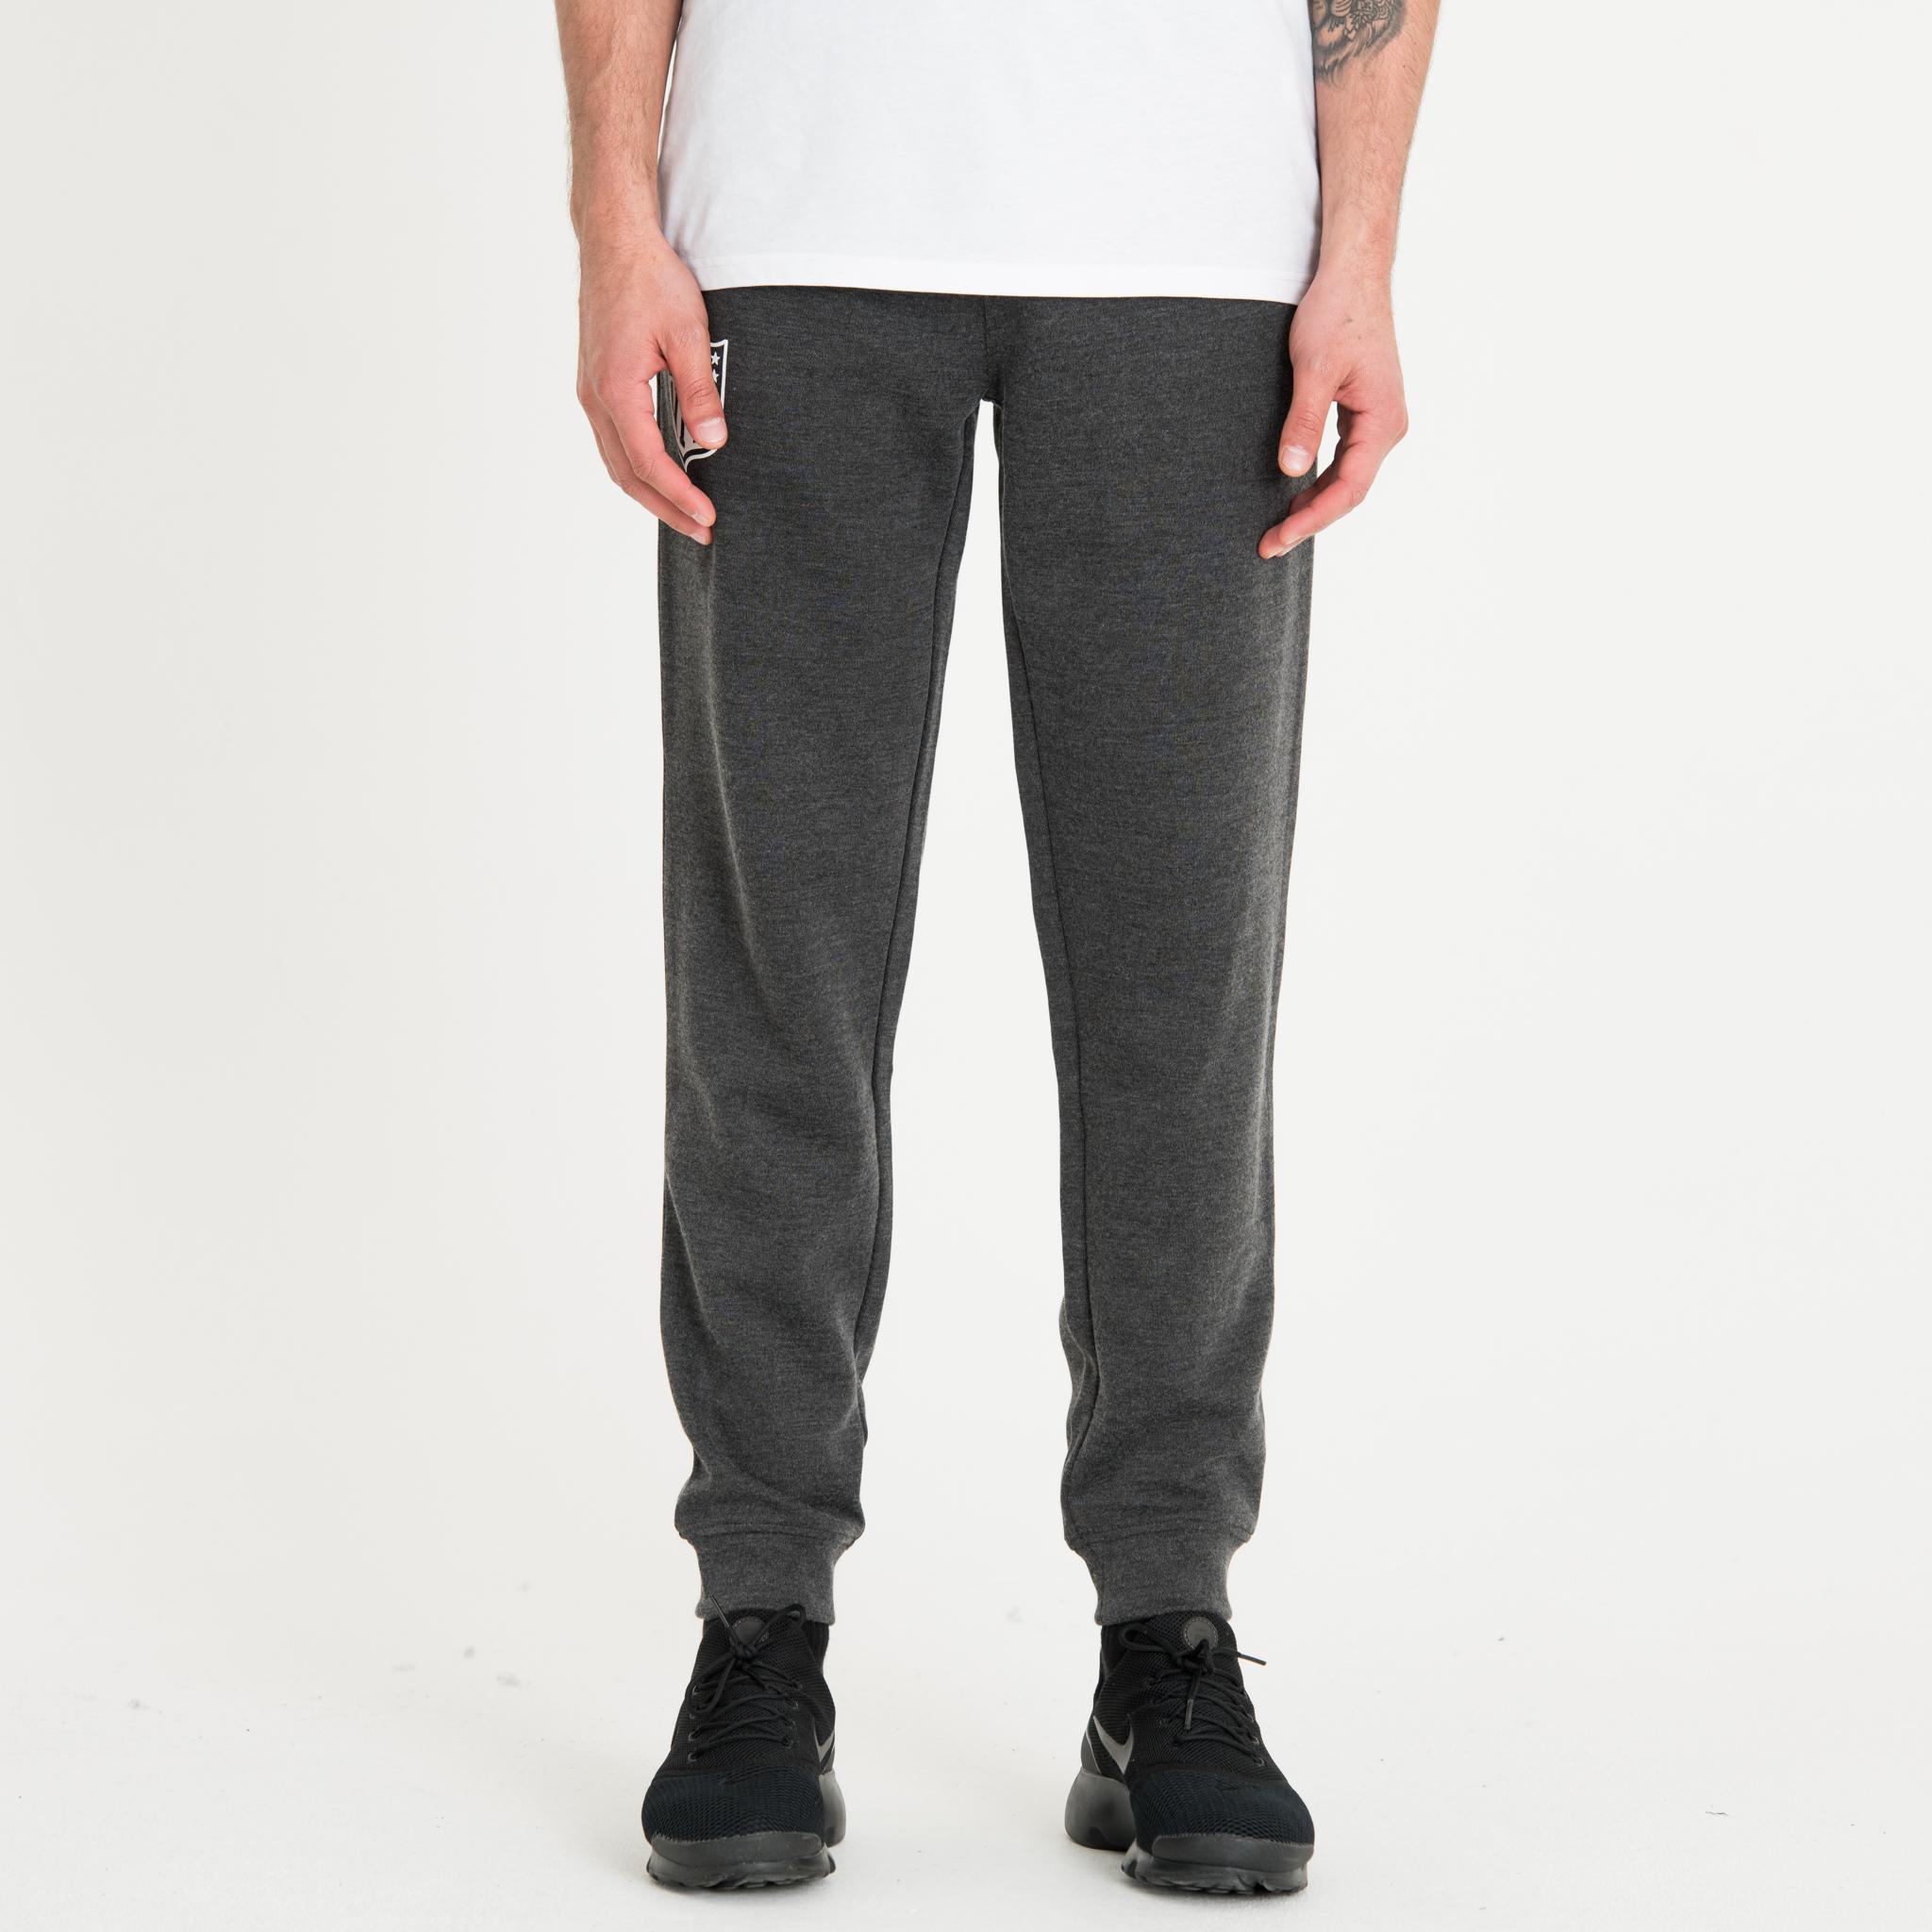 Pantalones de chándal NFL Logo, gris